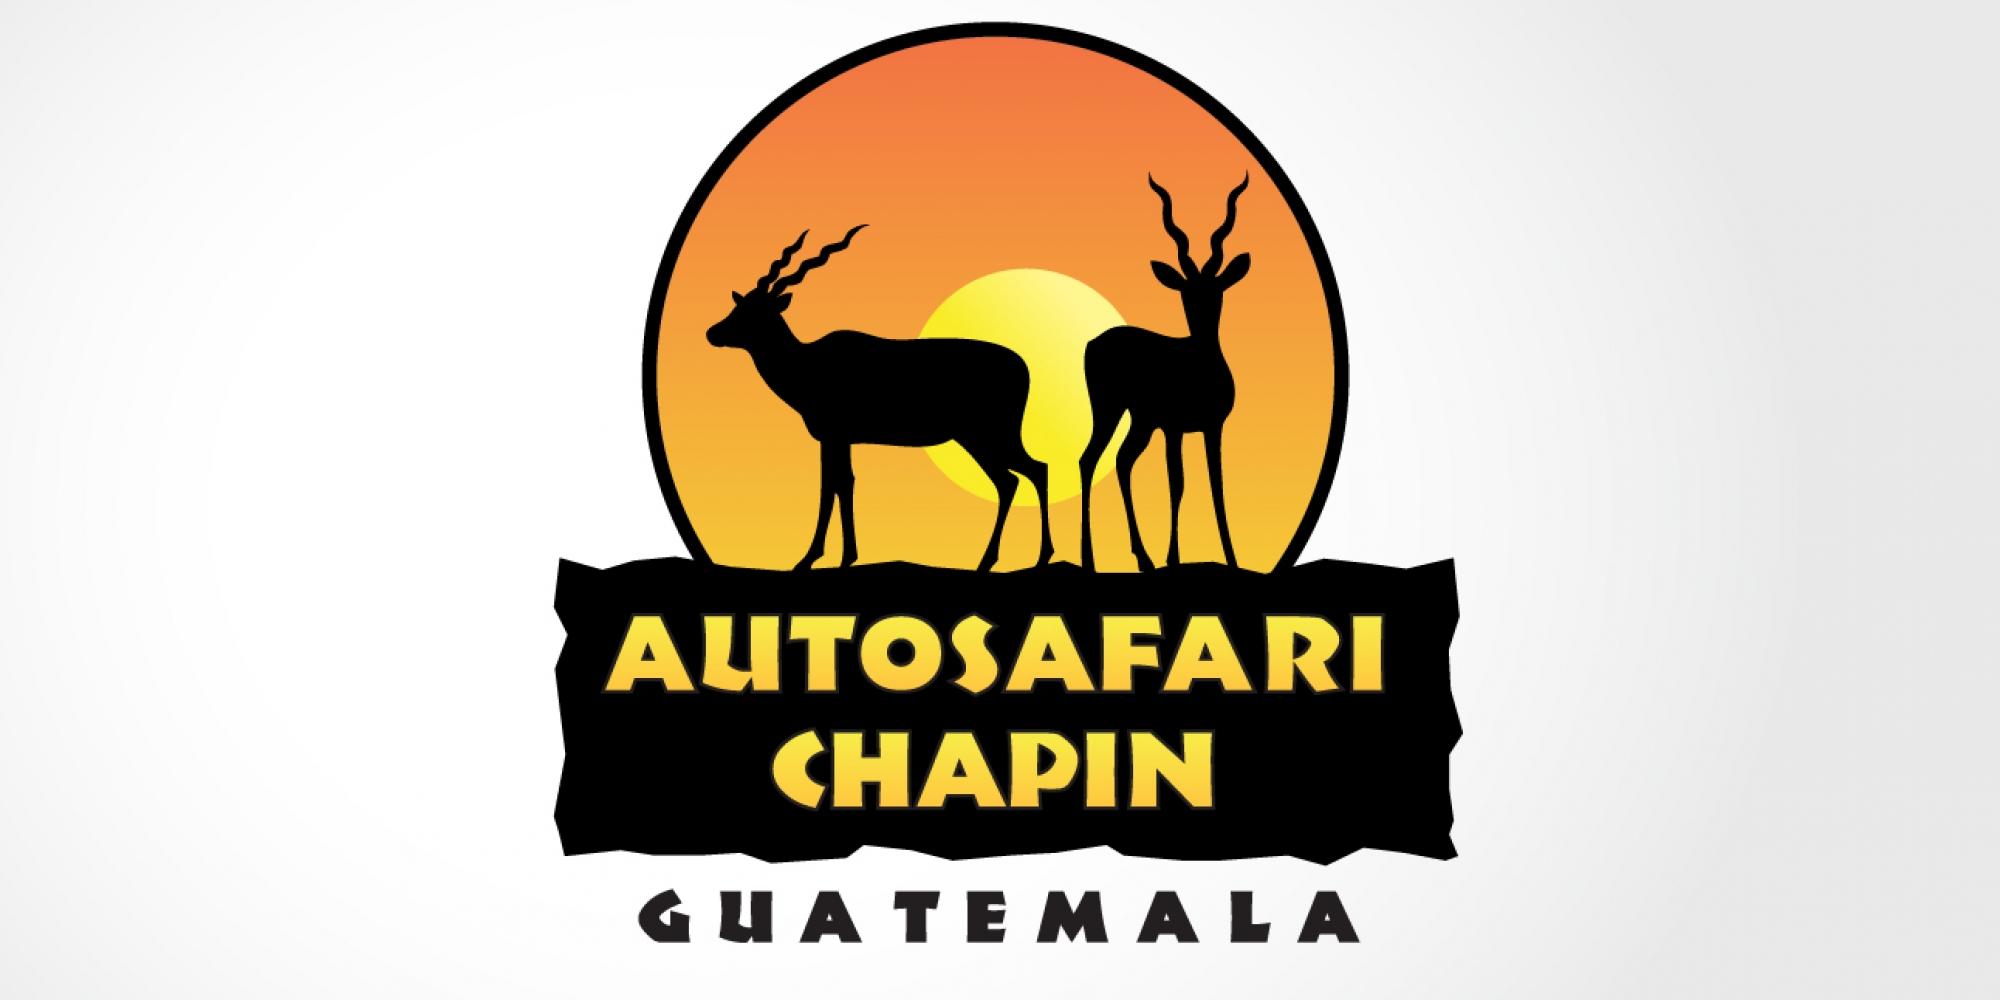 autosafari-chapin-logo